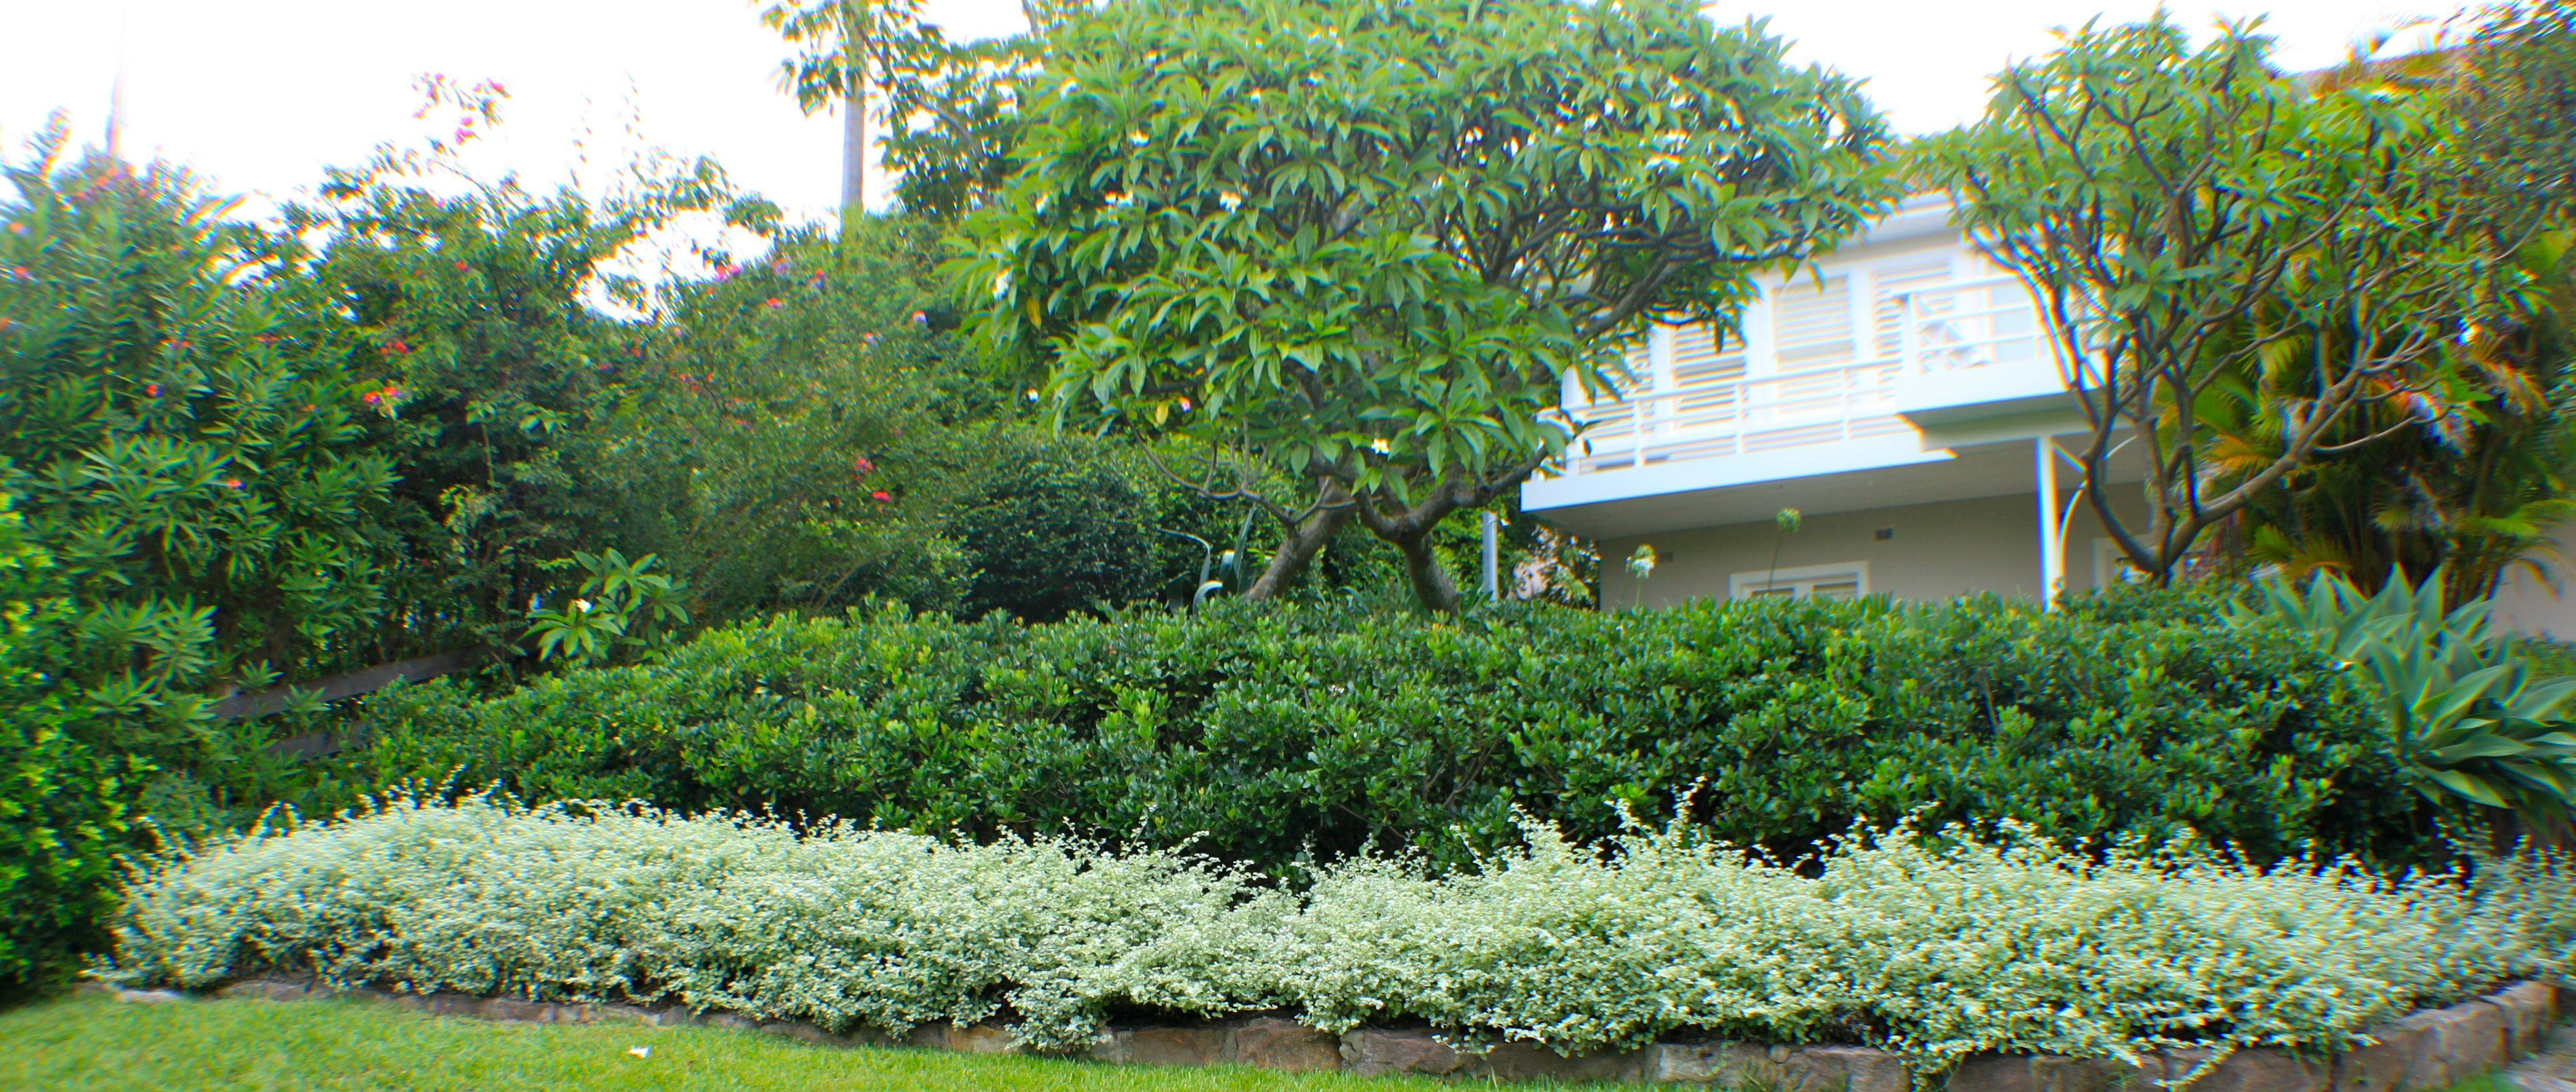 Helichrysum petiolare- Palm Beach Sydney Australia